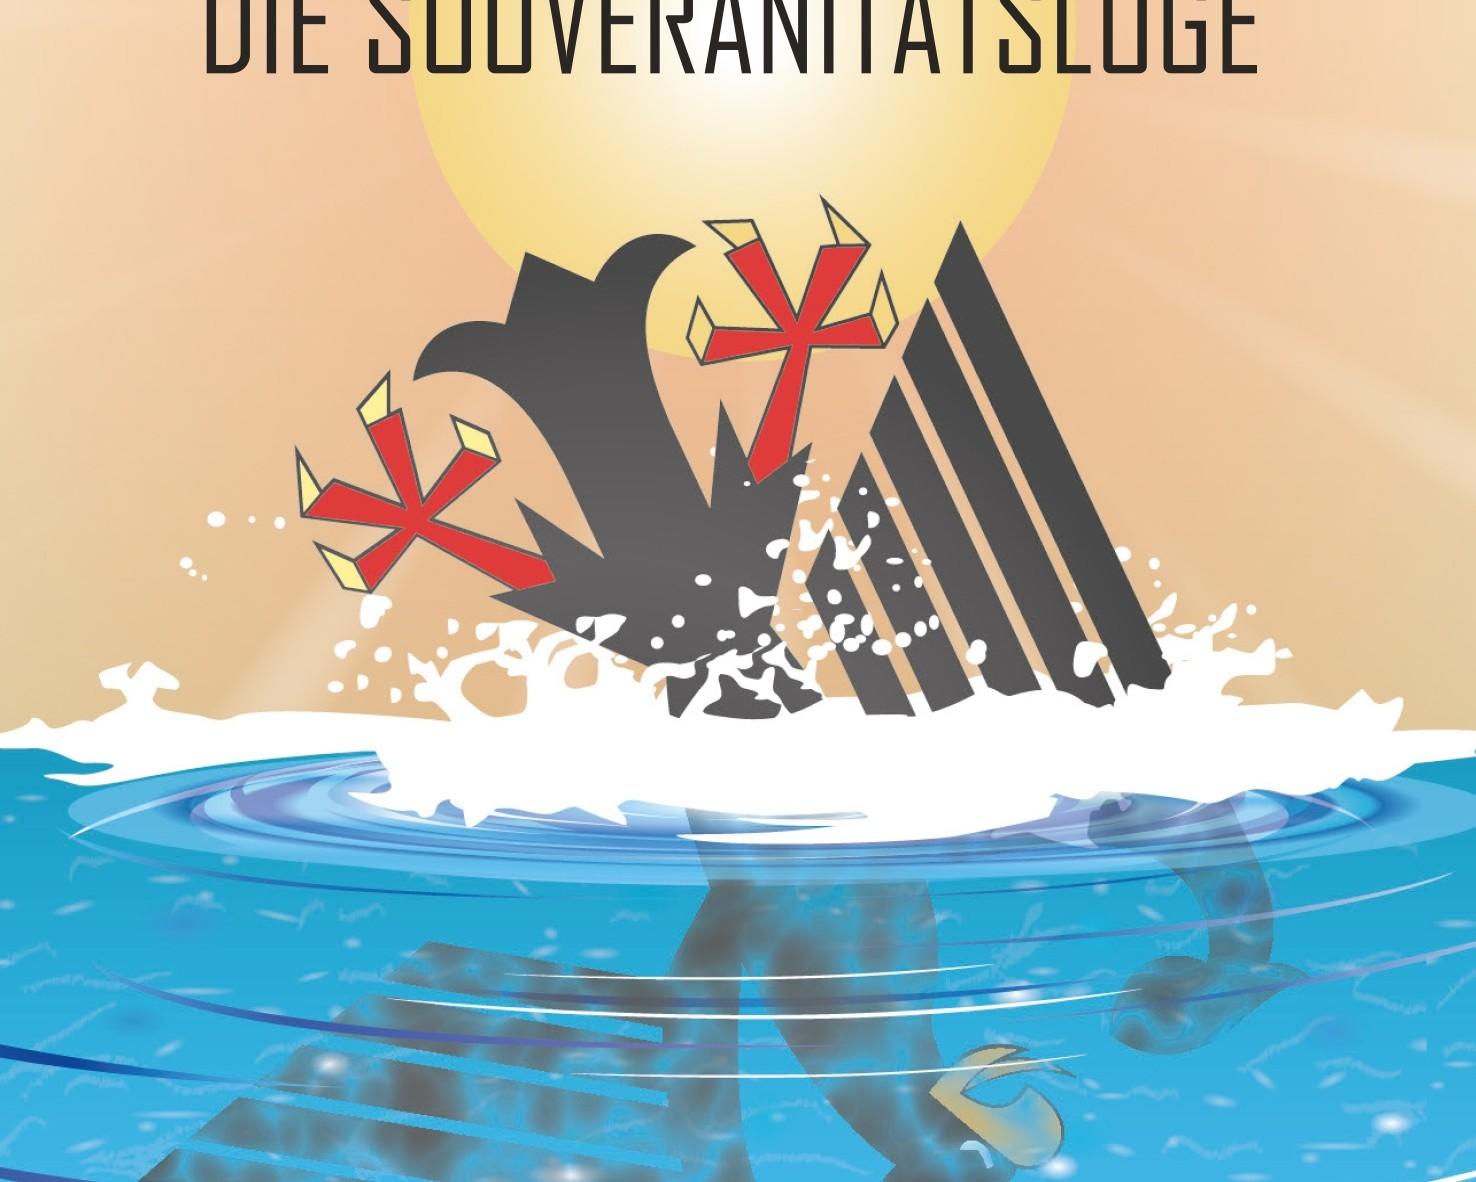 cover-souveraenitaetsluege.jpg